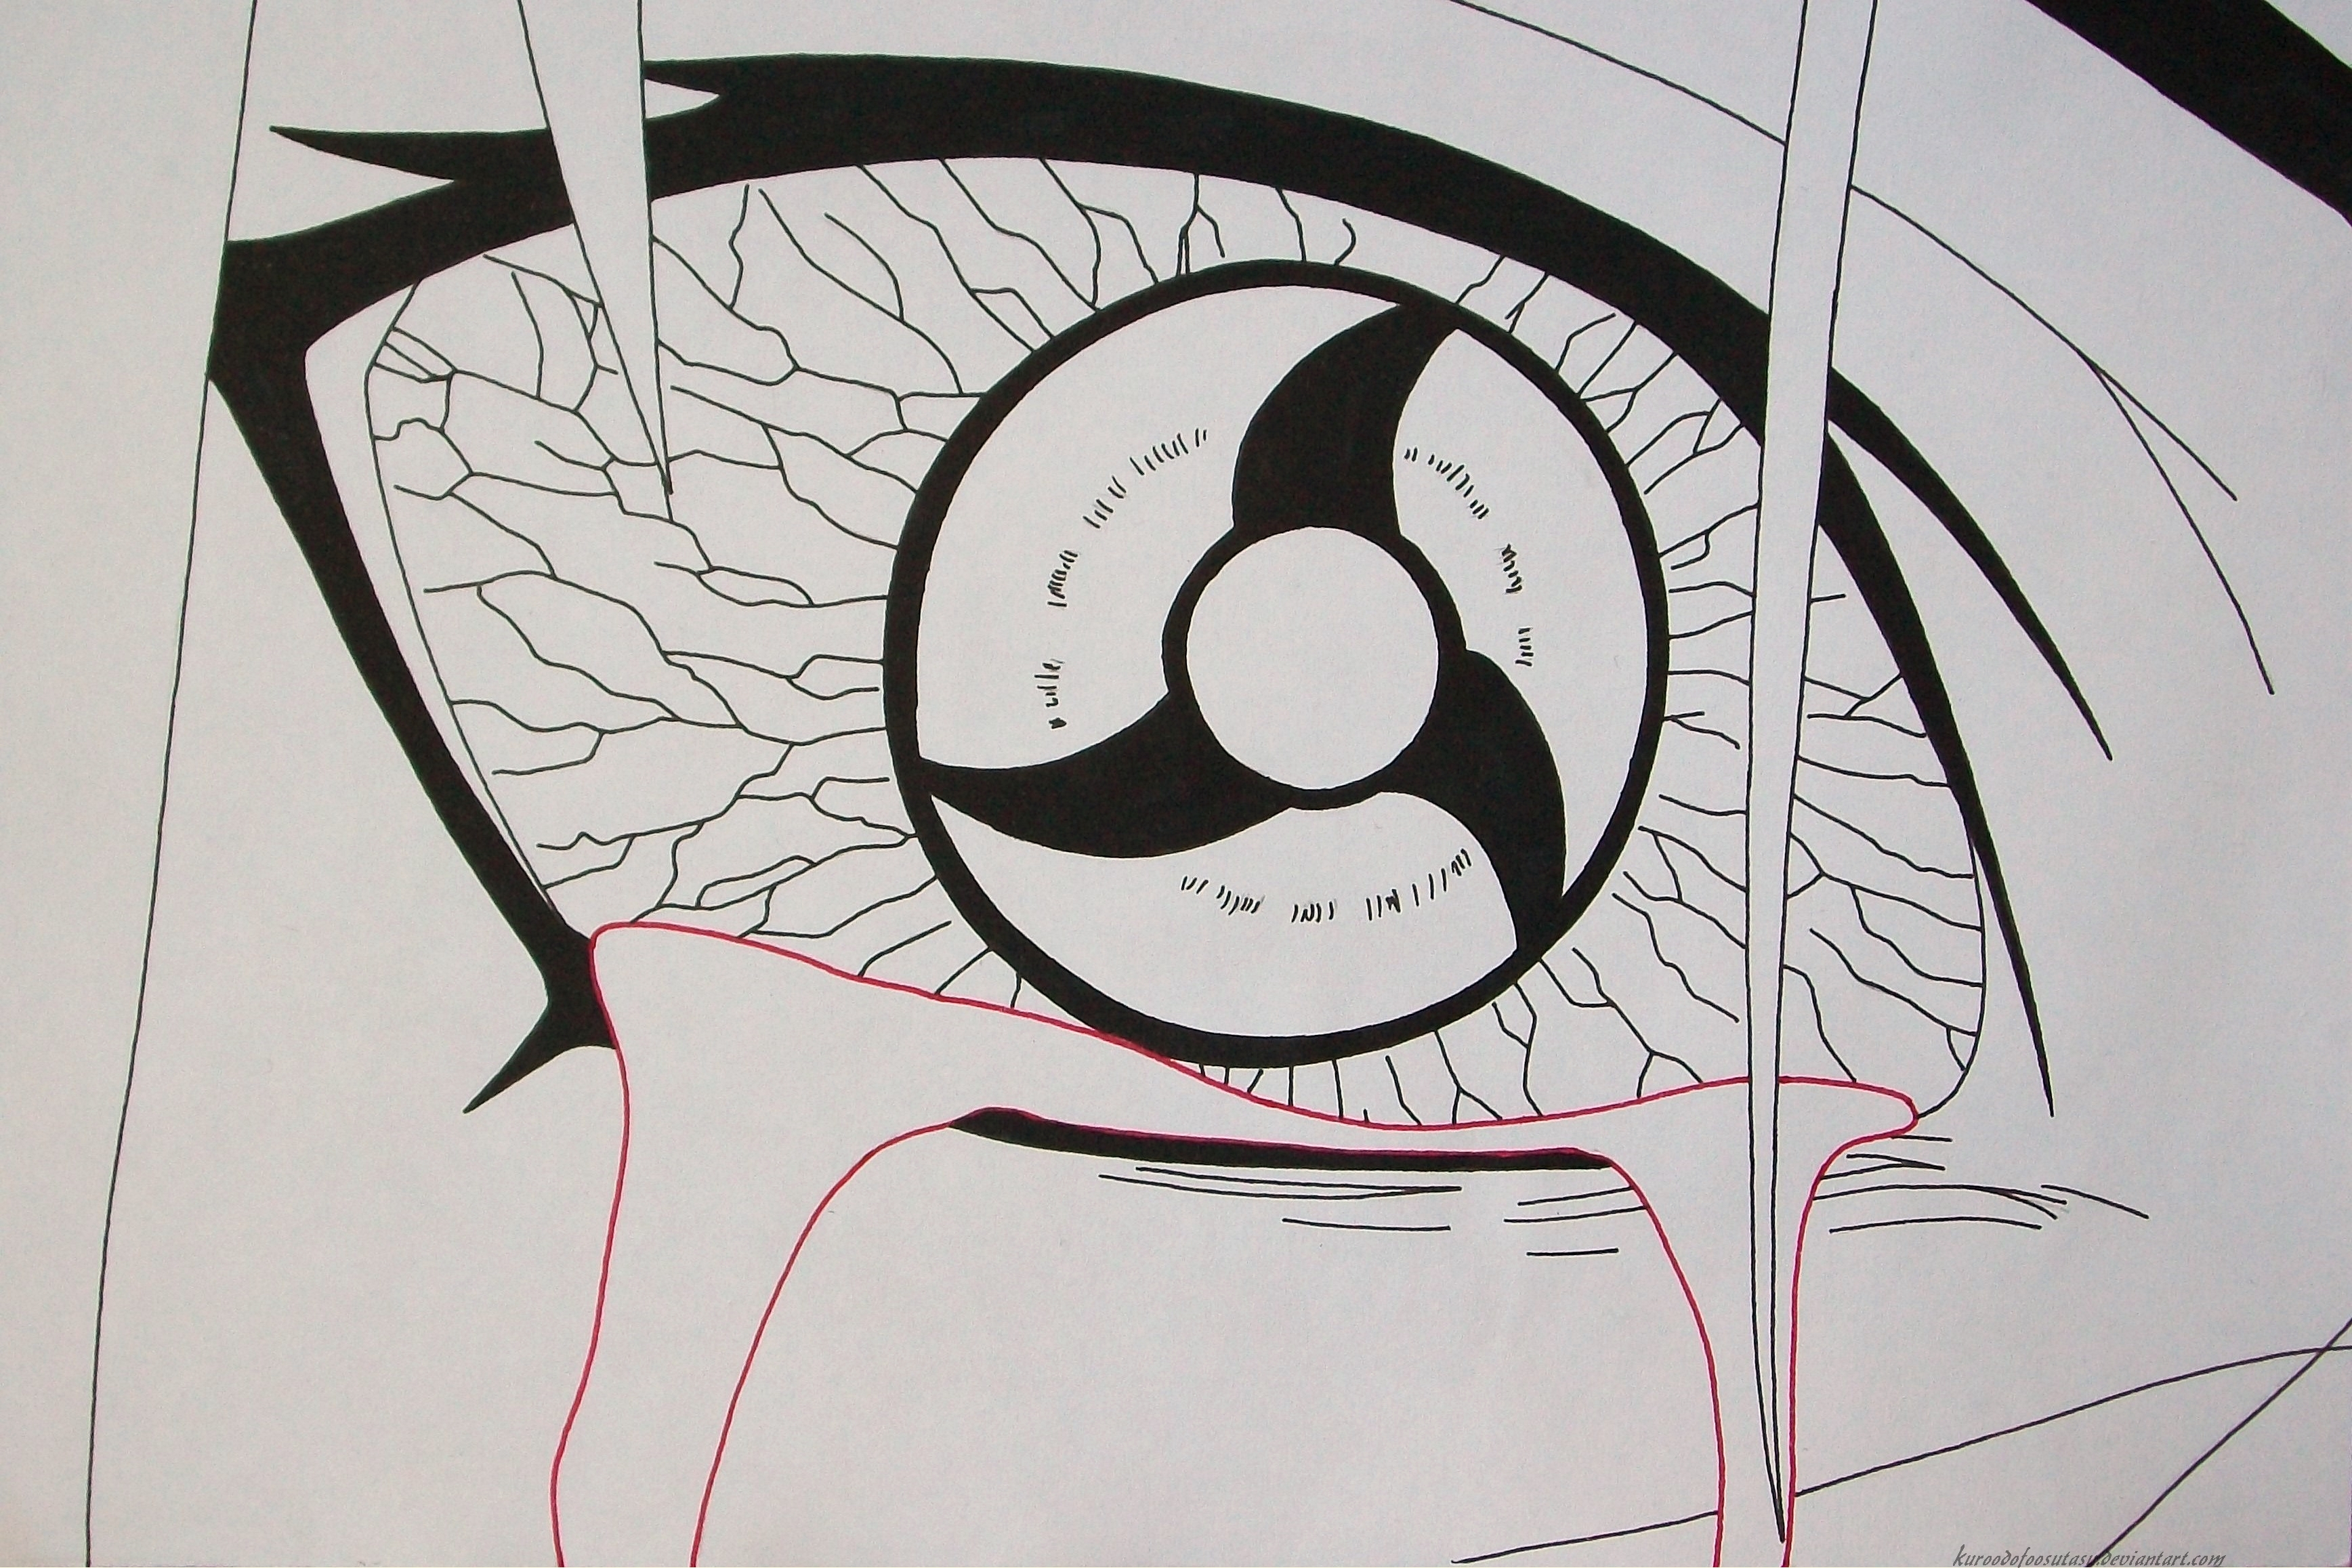 How To Draw Kakashi's Mangekyou Sharingan - Step By Step ... |Itachi Mangekyou Sharingan Drawing